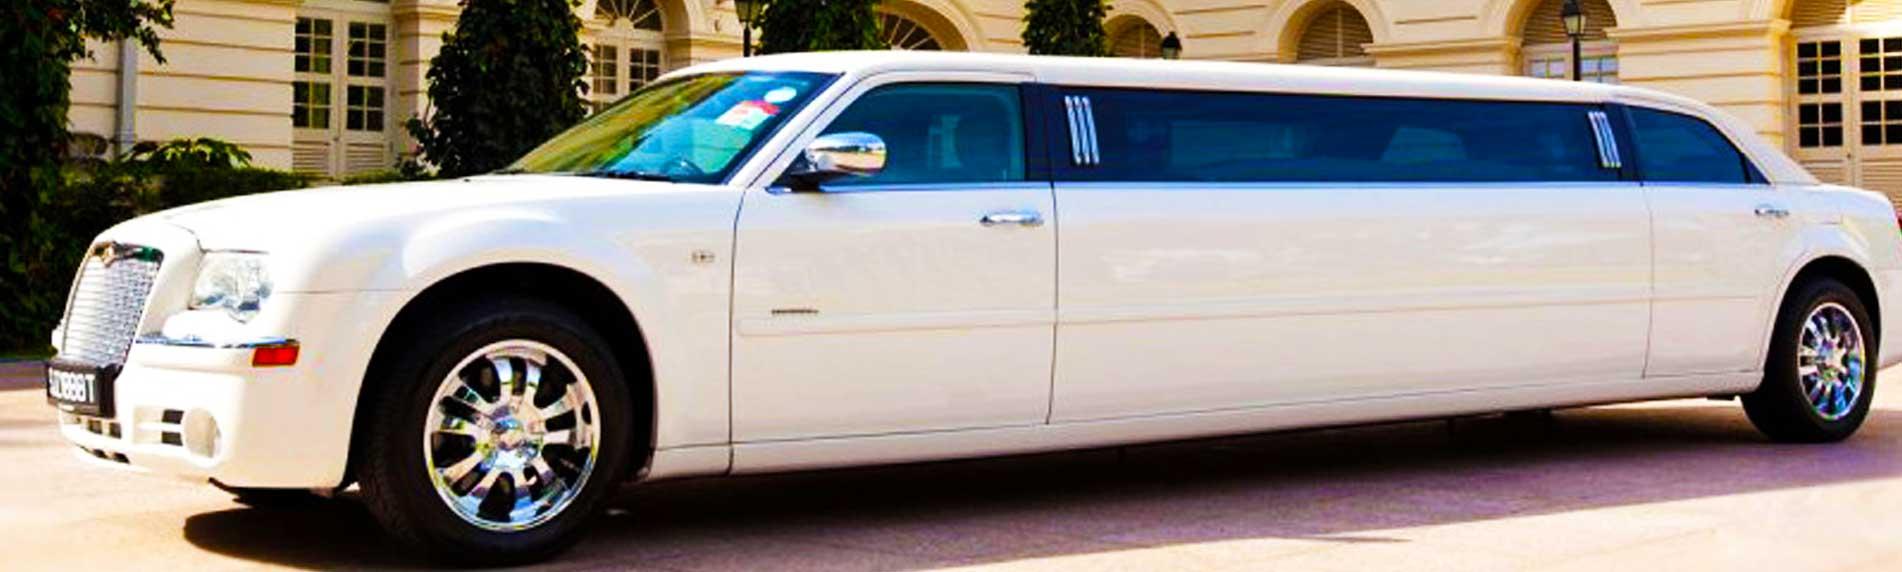 limousine tour singapore